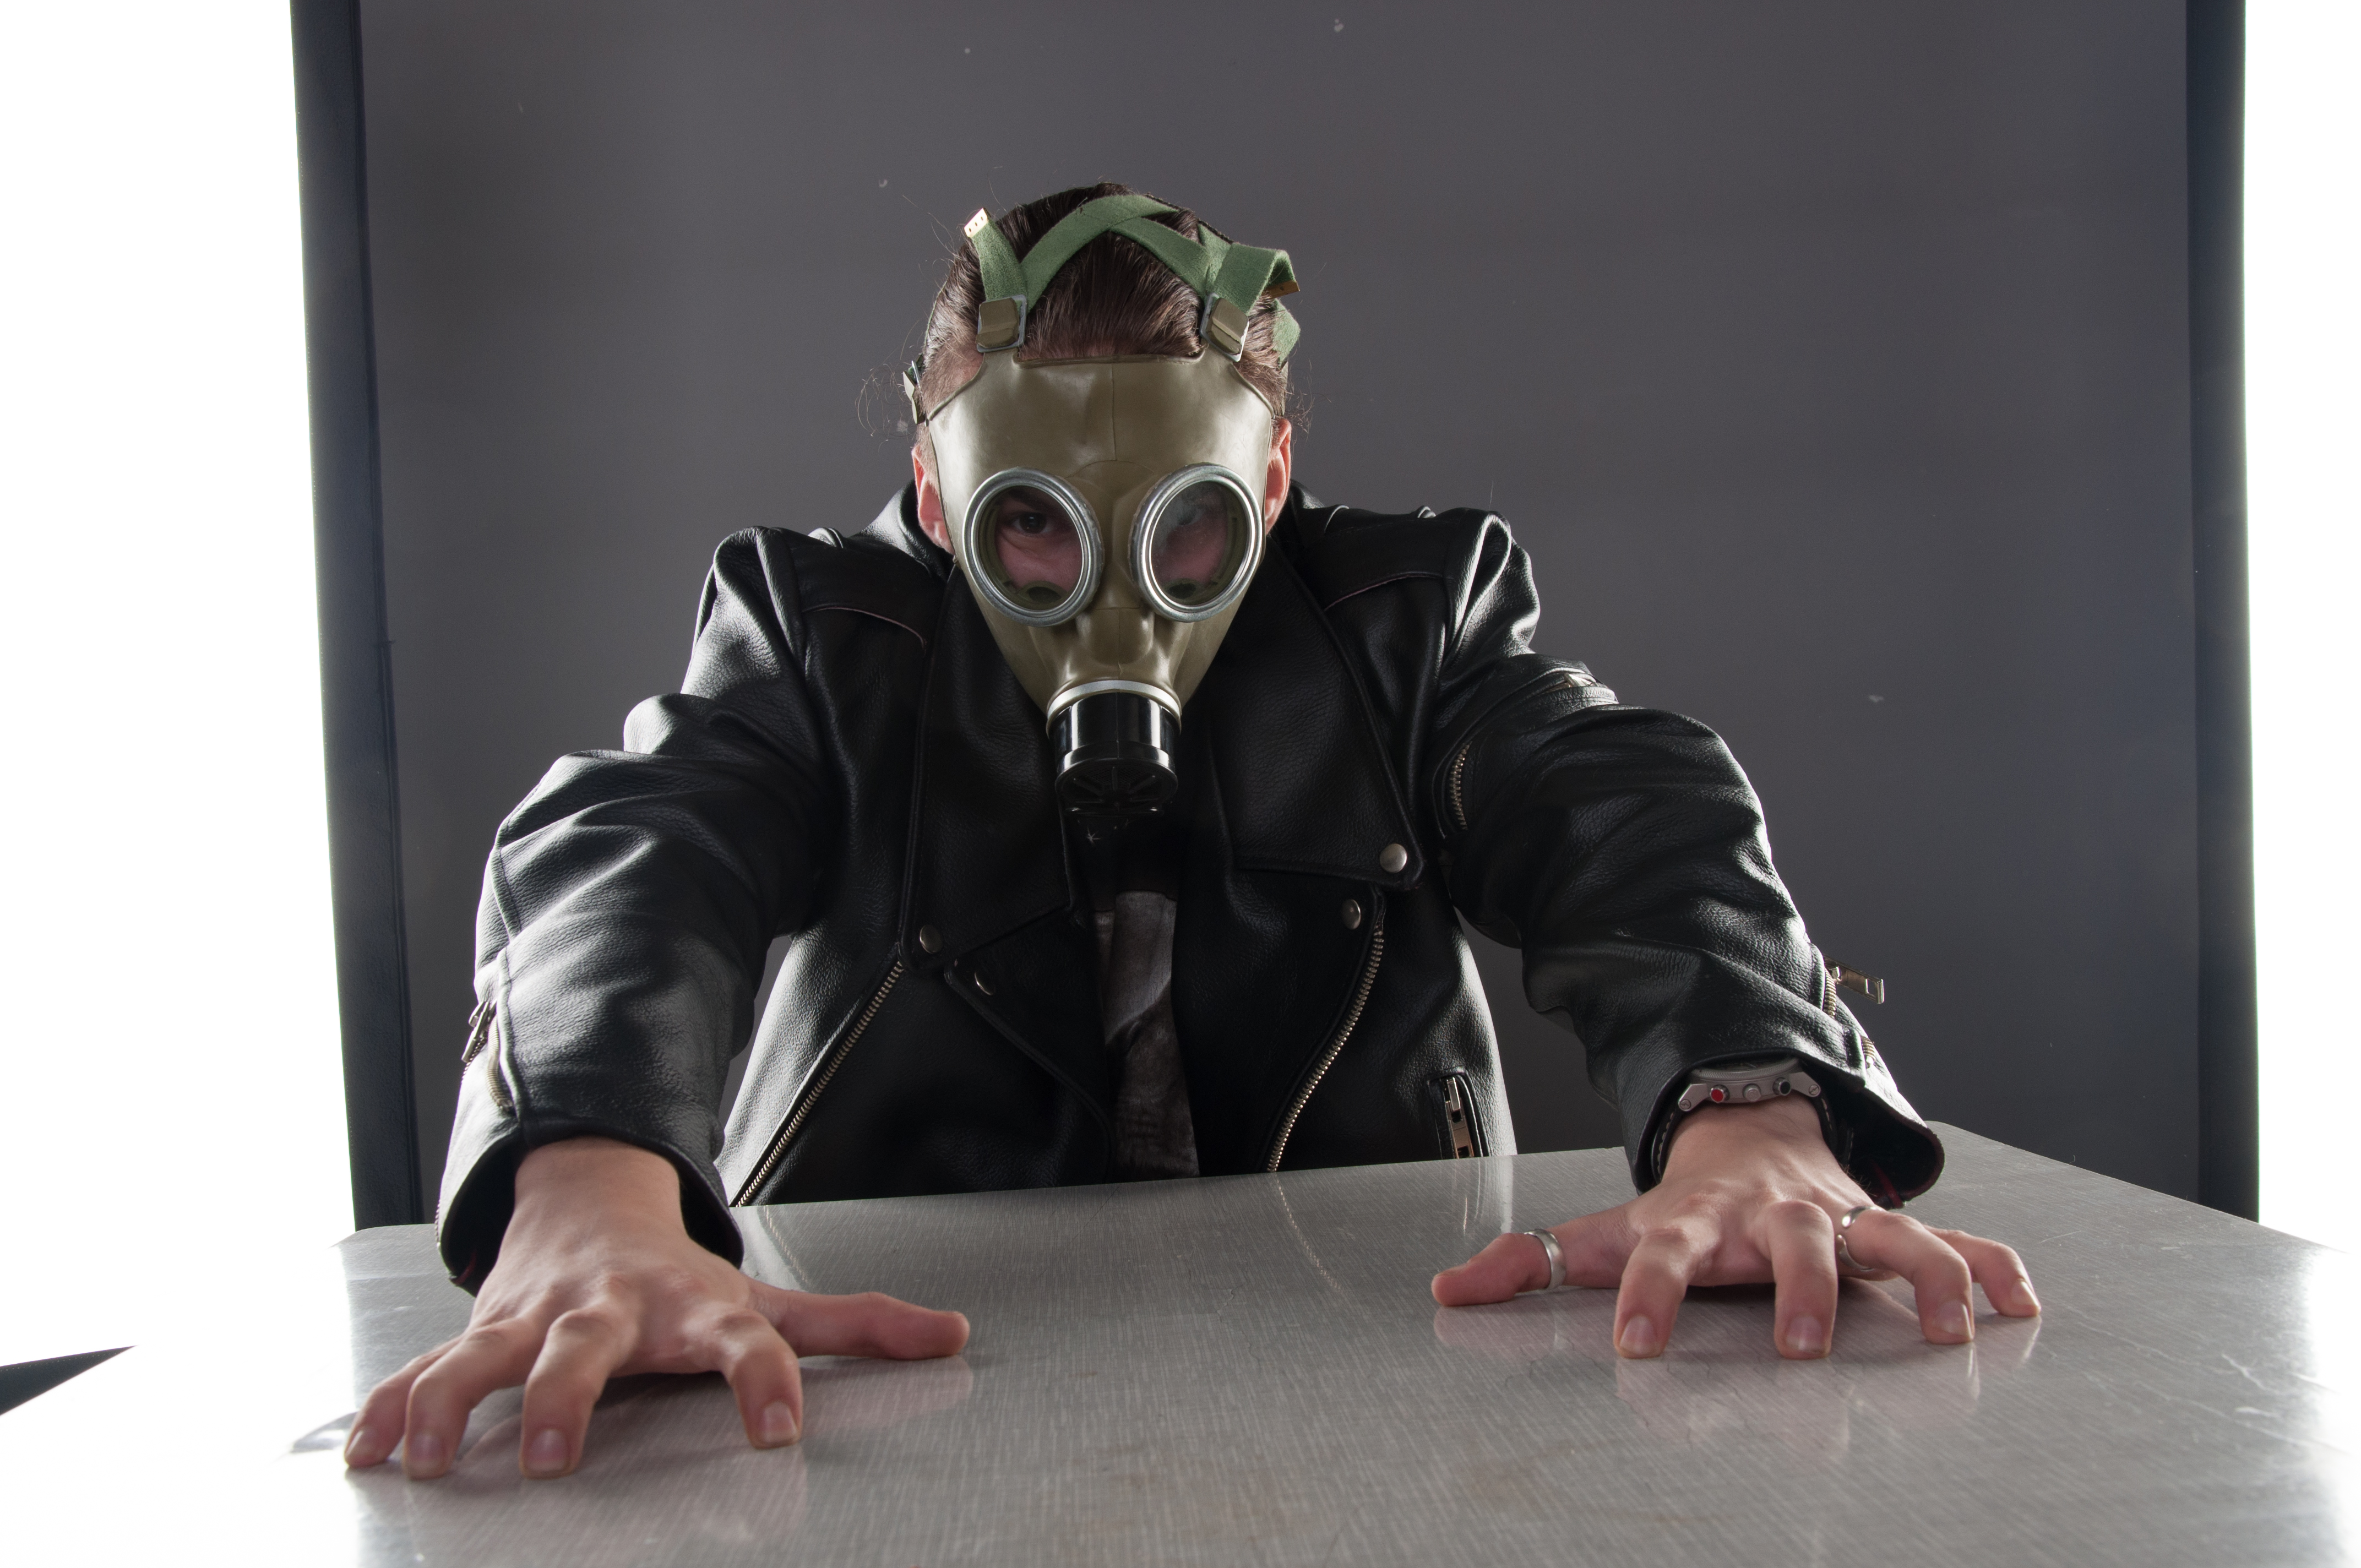 Gas Mask 6 by kryminalistycy-STOCK